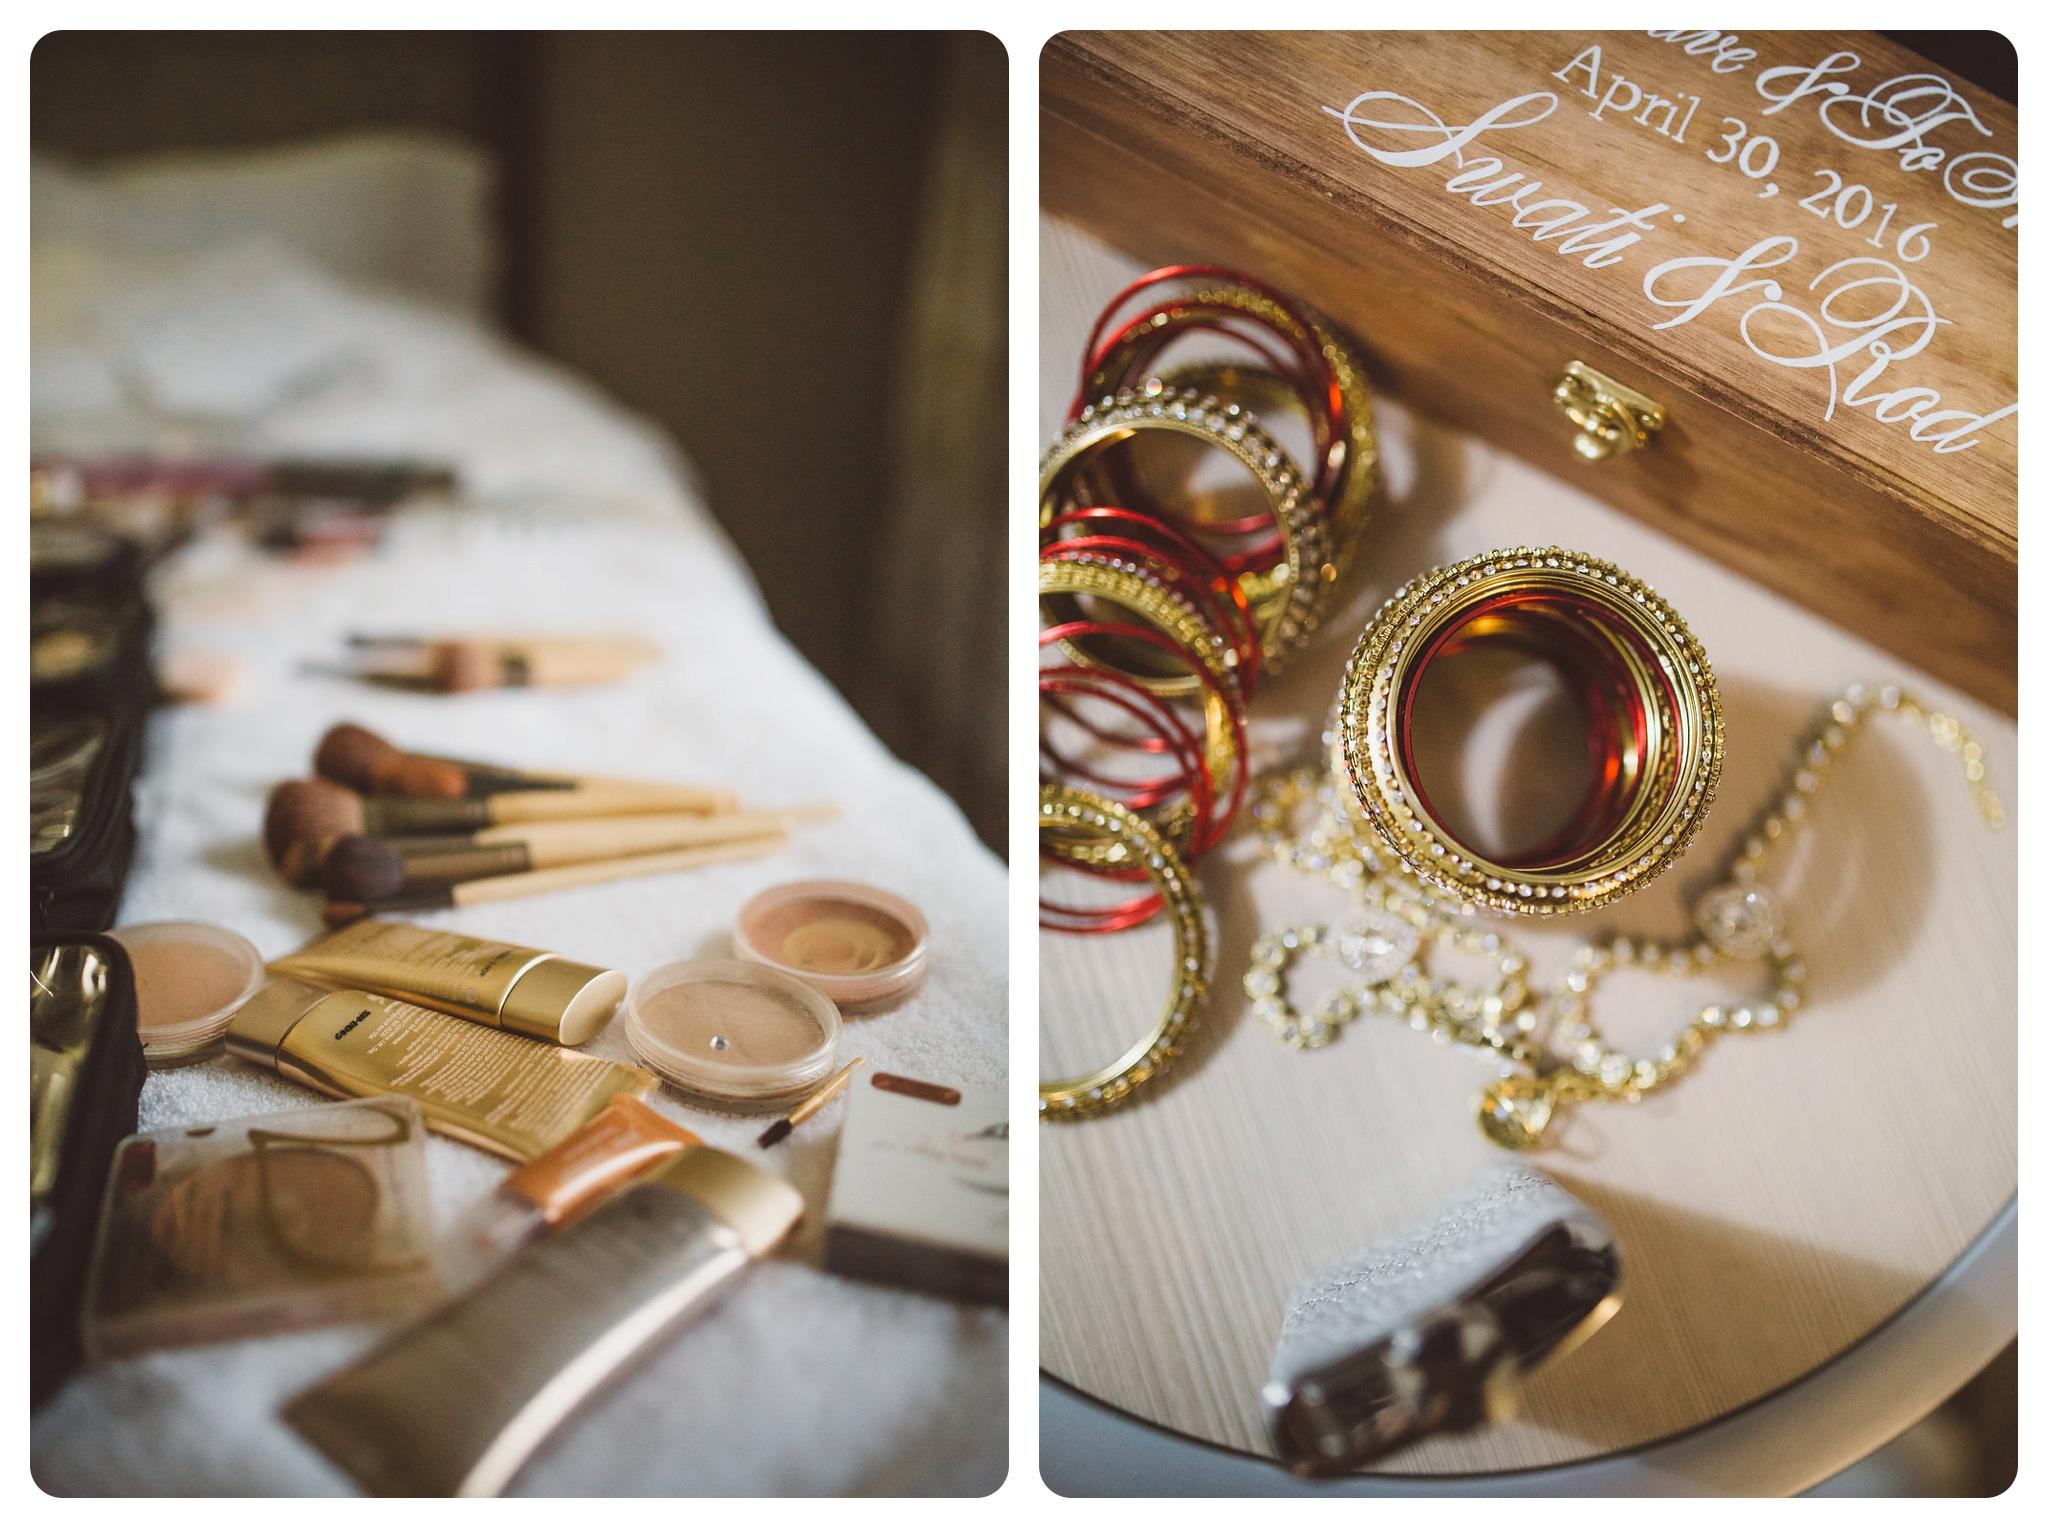 Virginia-Weddings-Center-in-the-Square-Pat-Cori-Photography-002.jpg